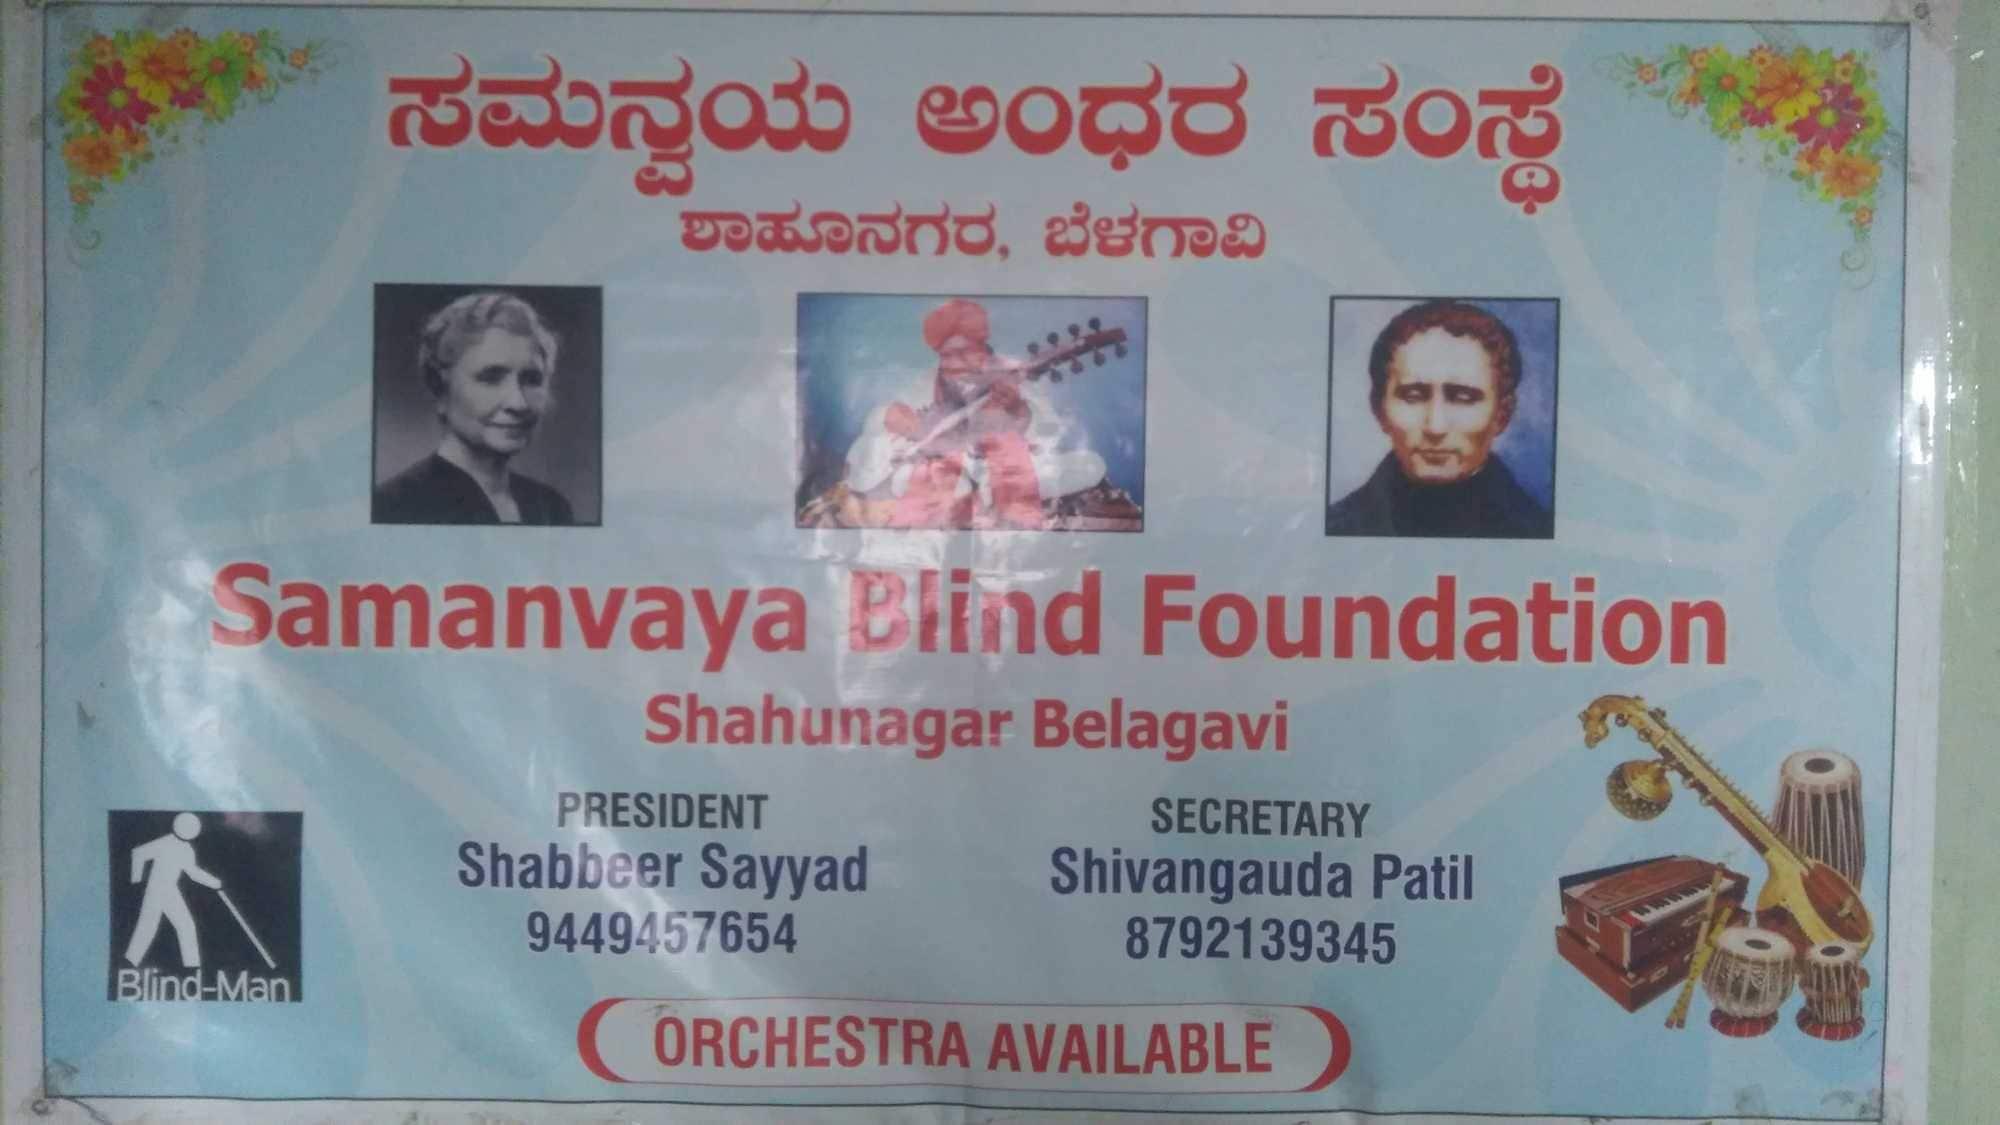 /media/samanway/1NGO-00365-Samanway_Blind_Foundation-Page-3.jpg